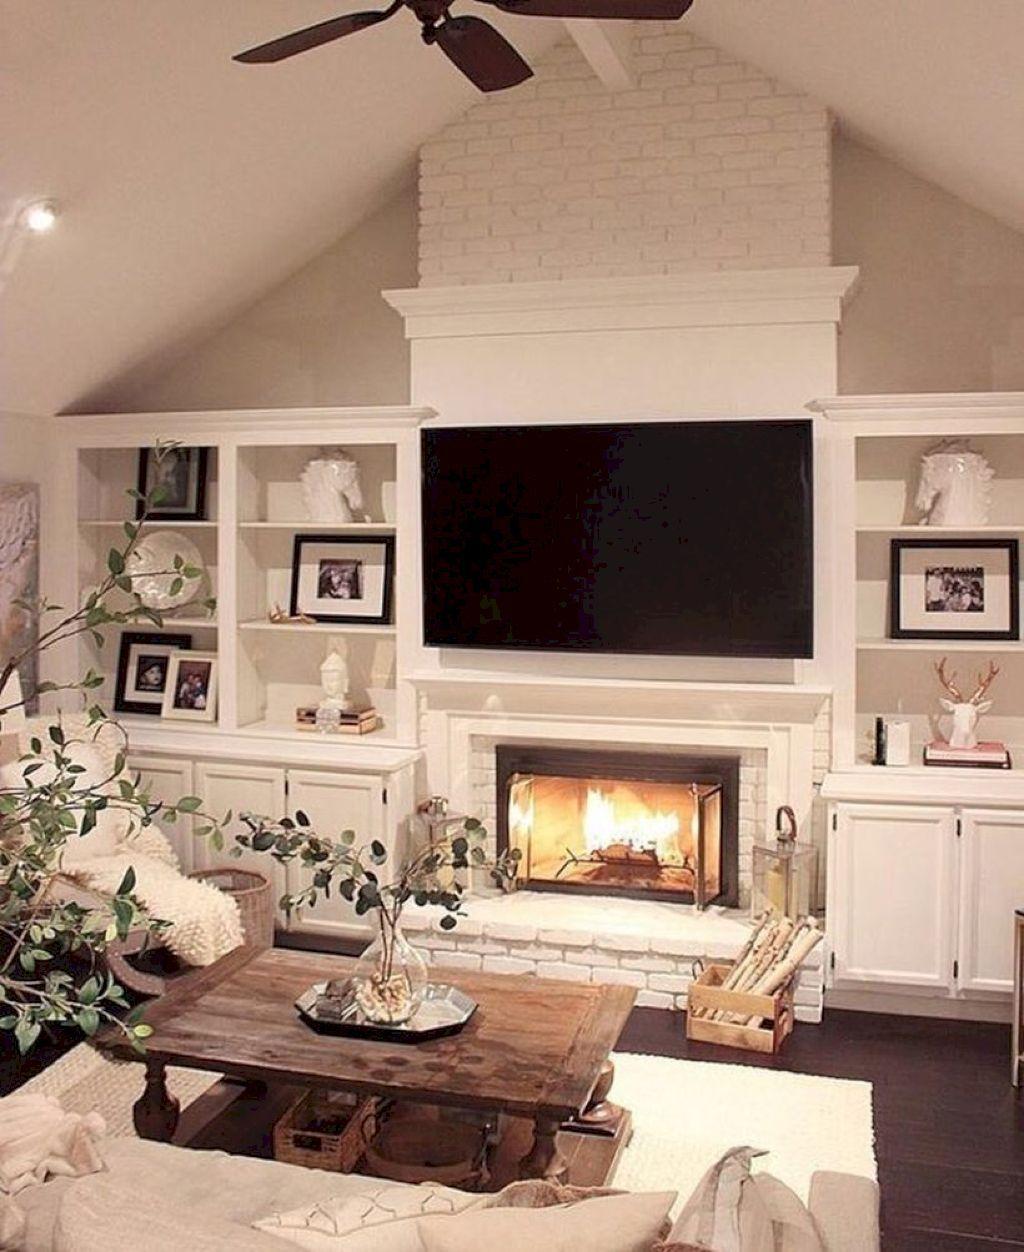 06 Rustic Farmhouse Living Room Decor I